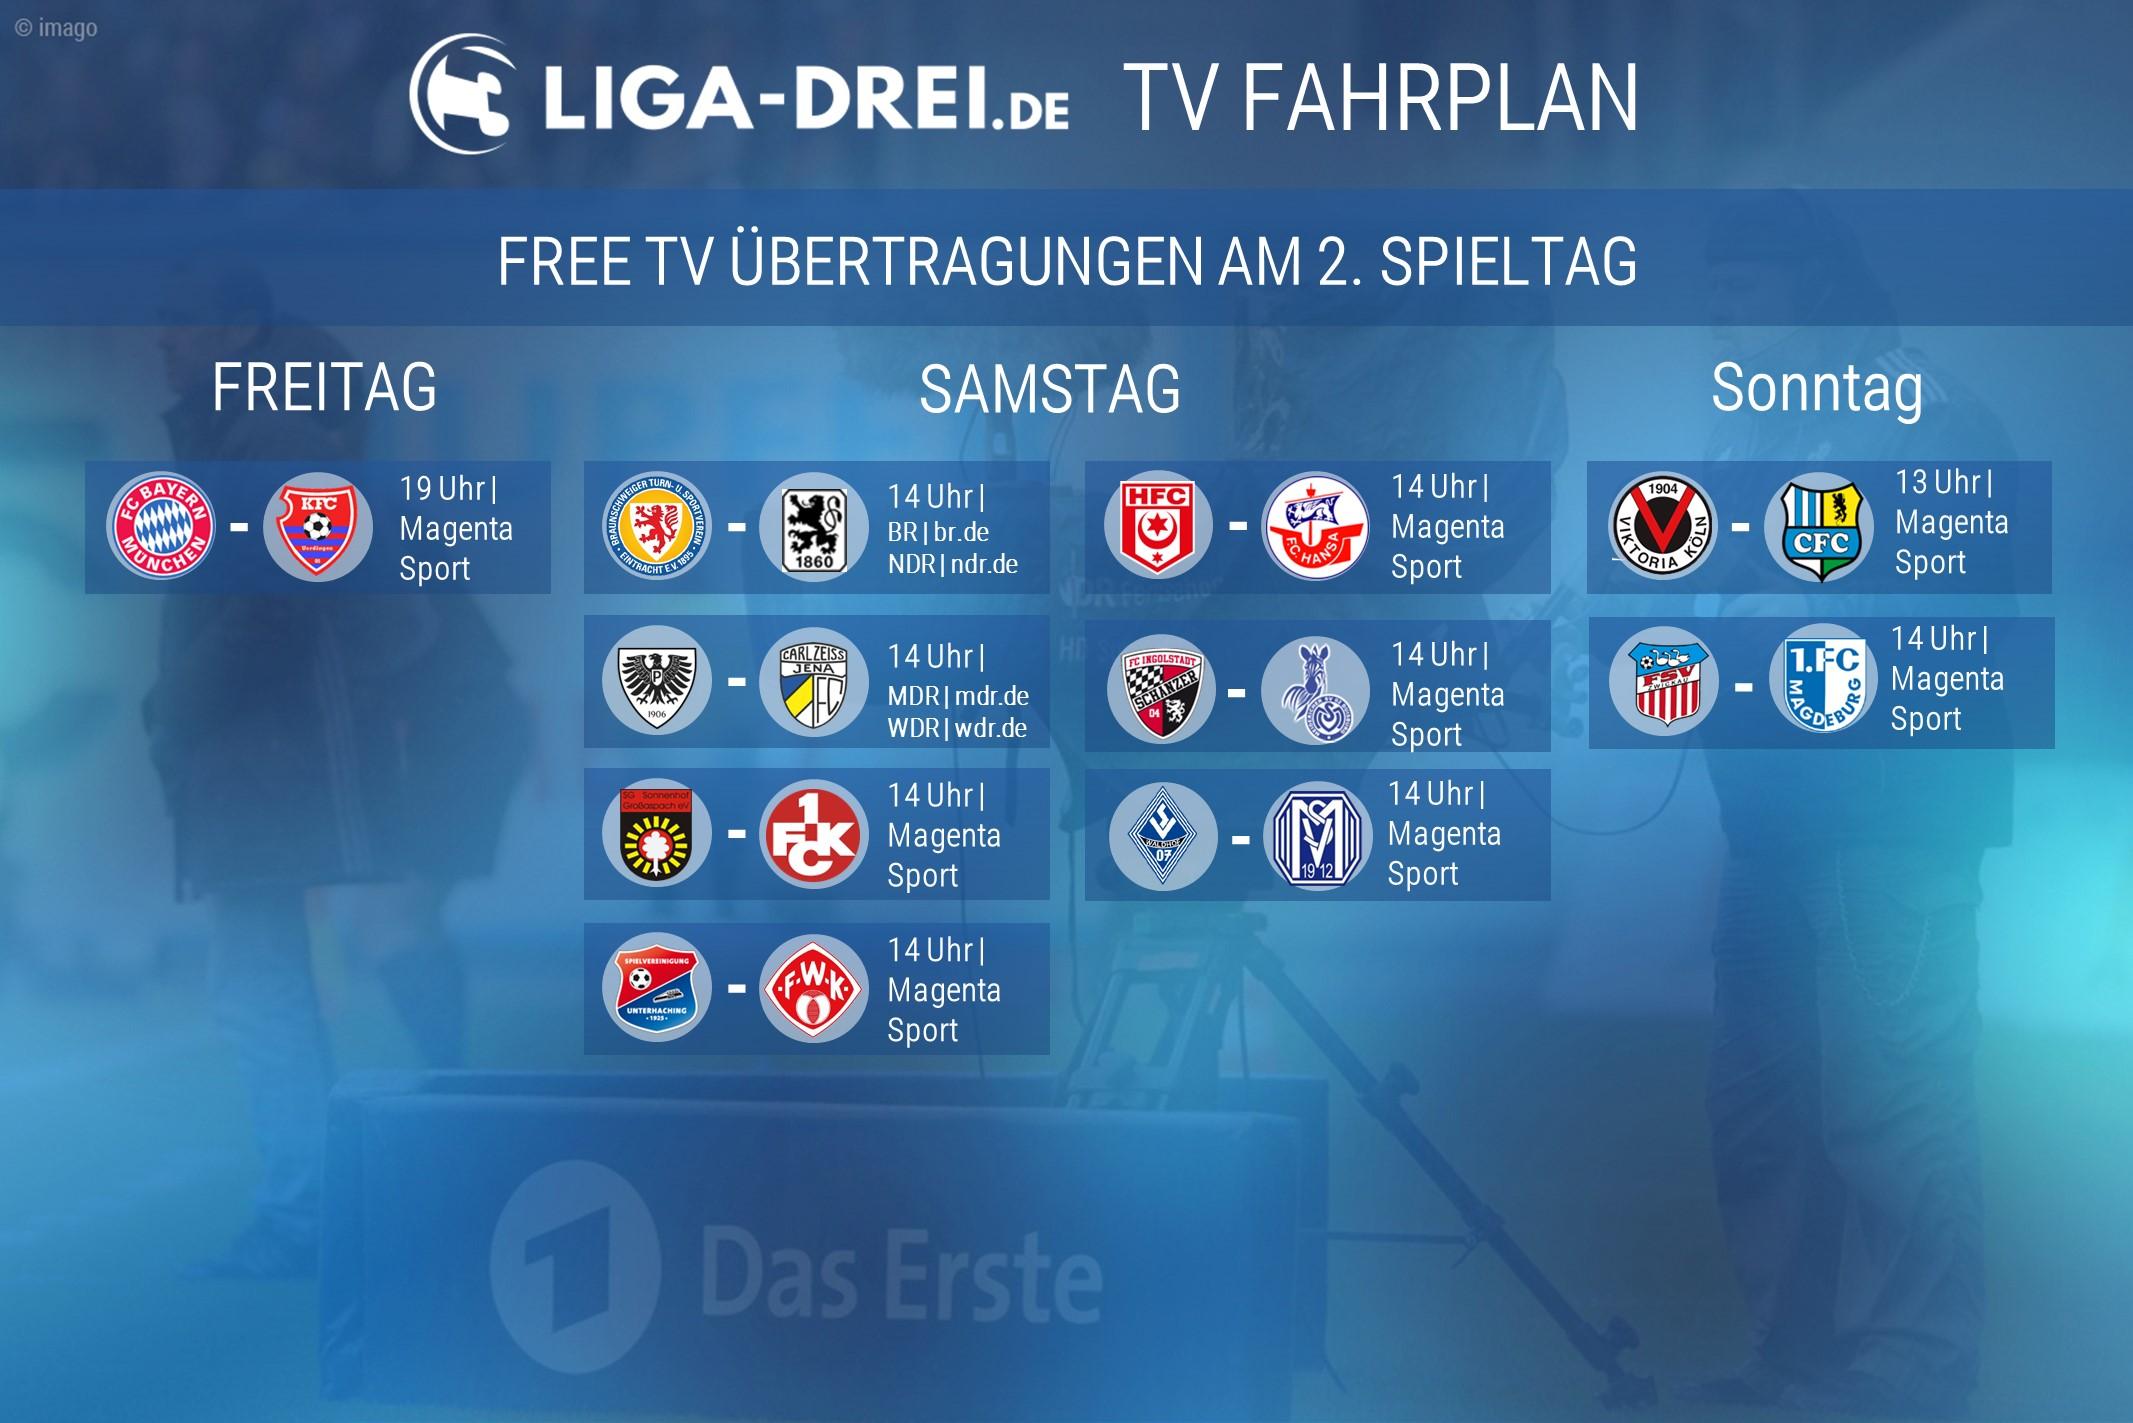 tv fahrplan, free tv, 3. liga